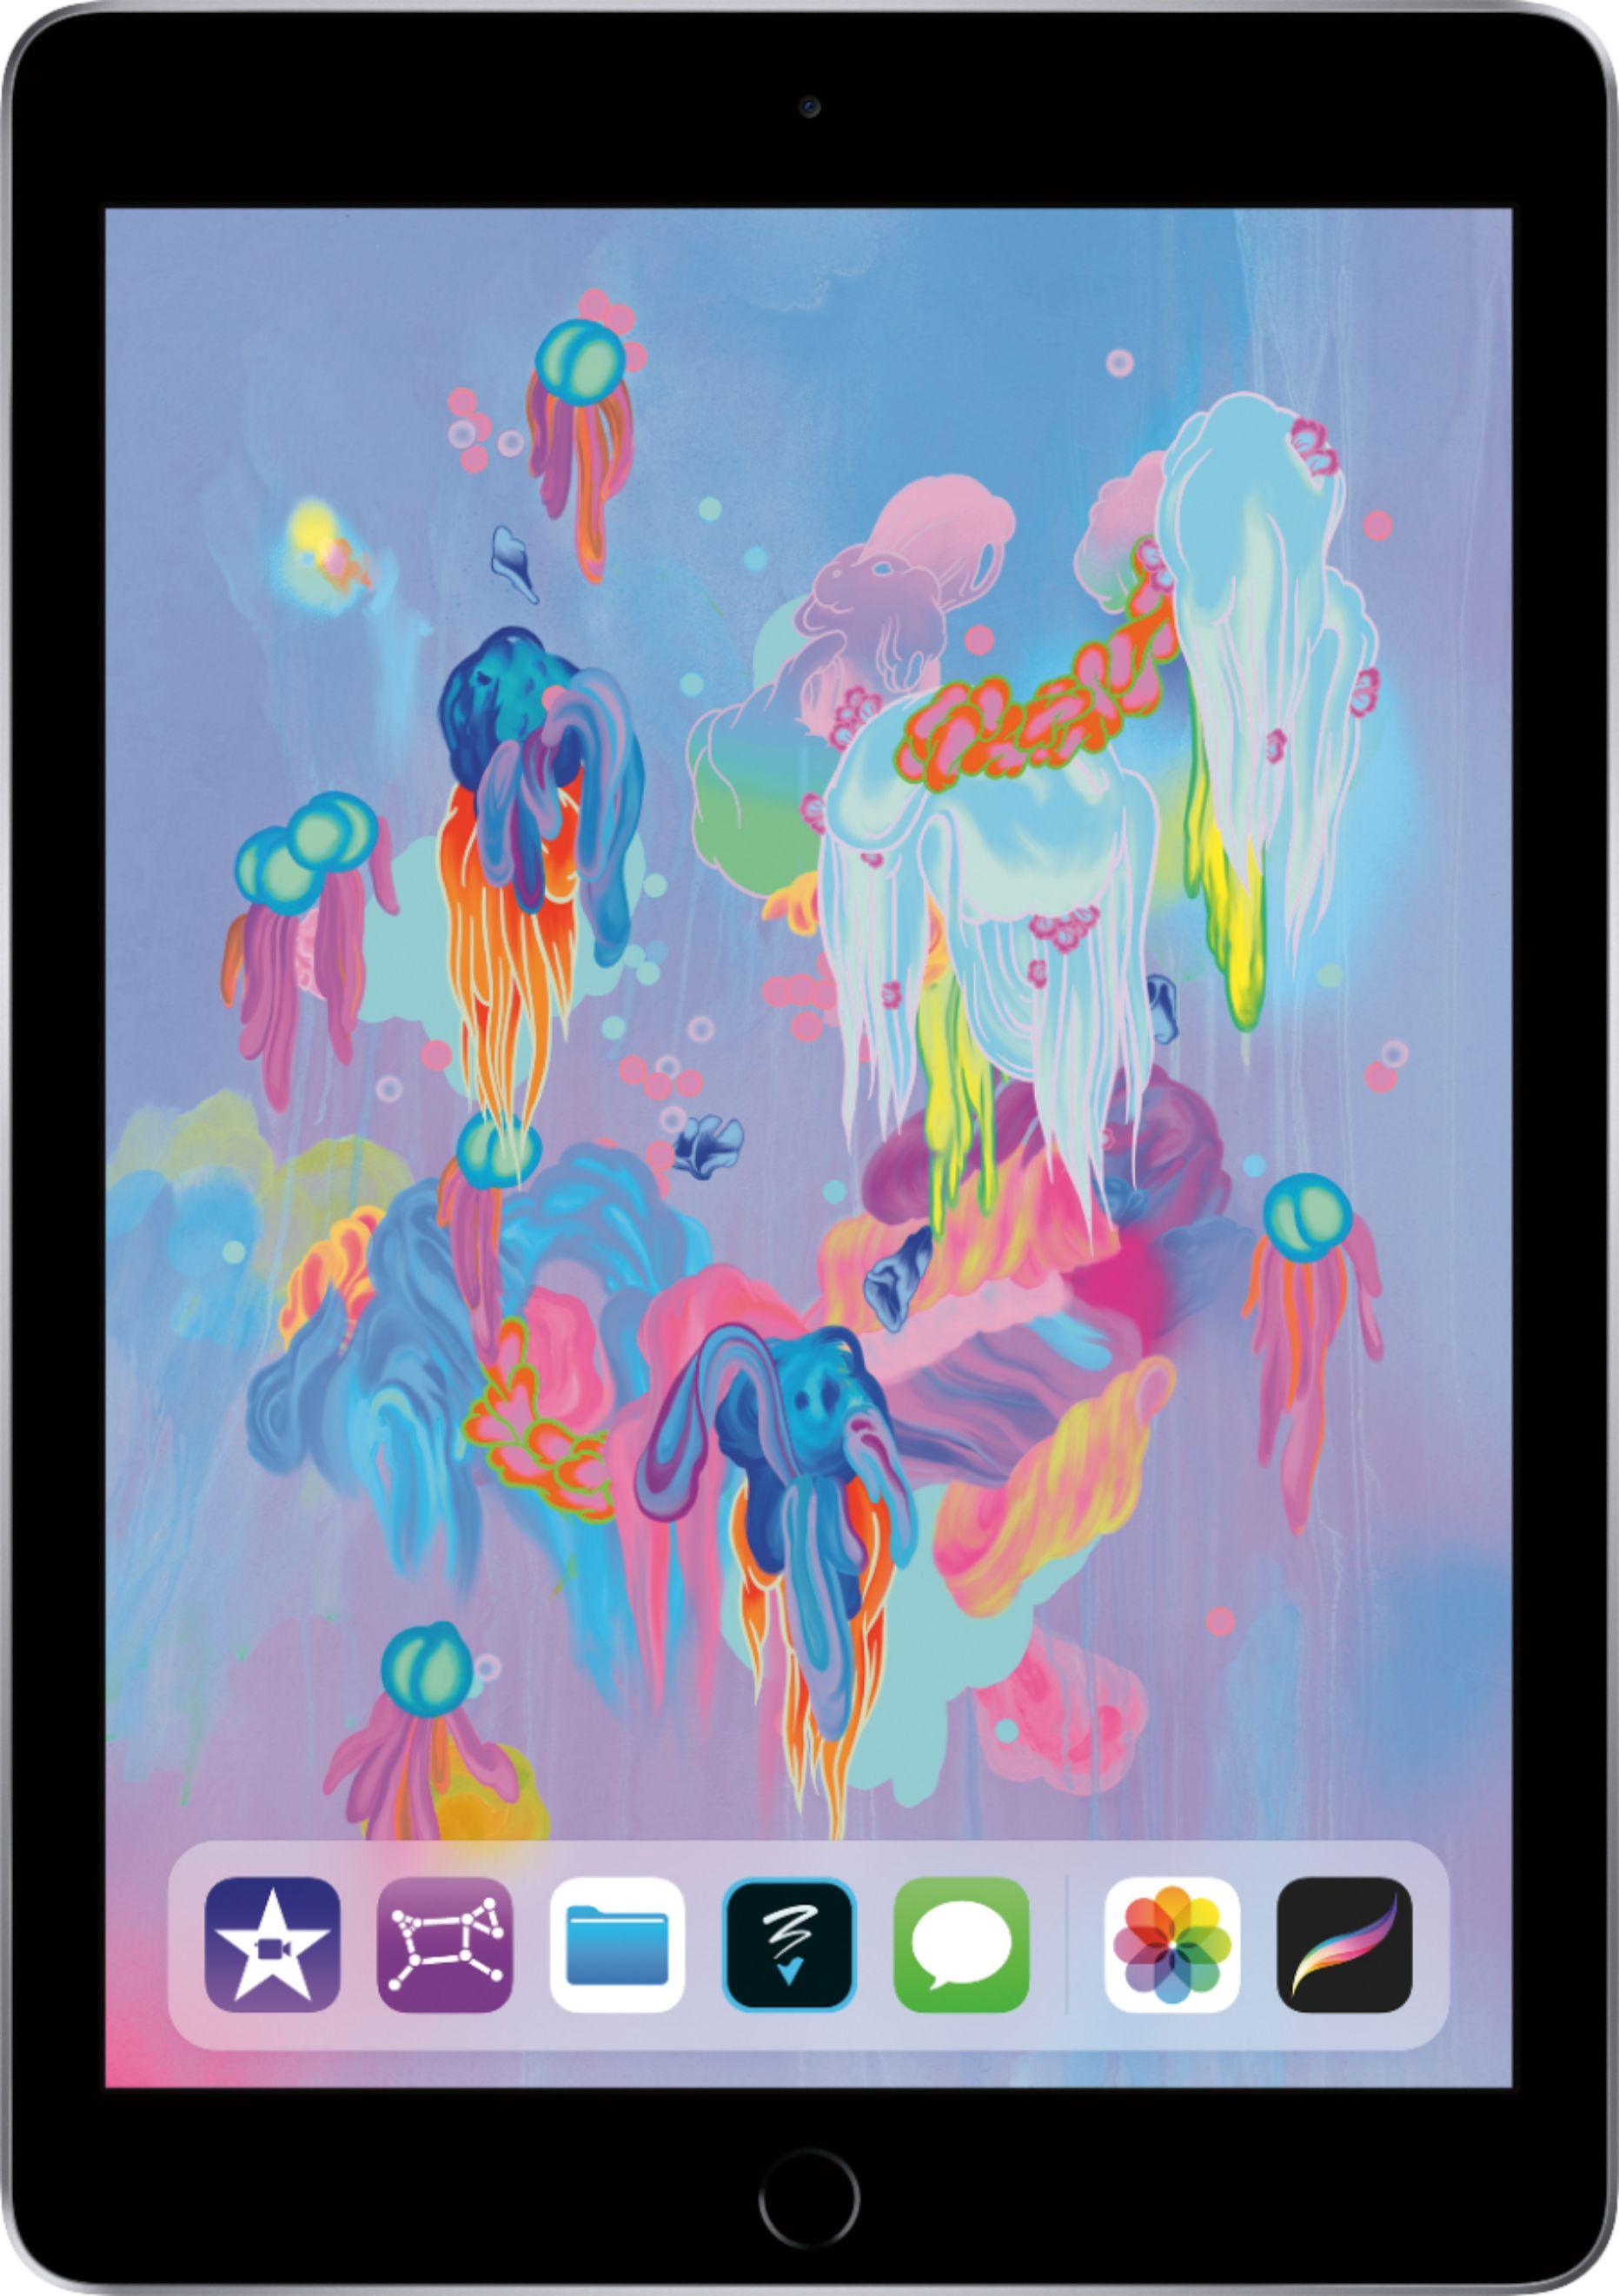 Apple - iPad (Latest Model) with Wi-Fi - 128GB - Space Gray